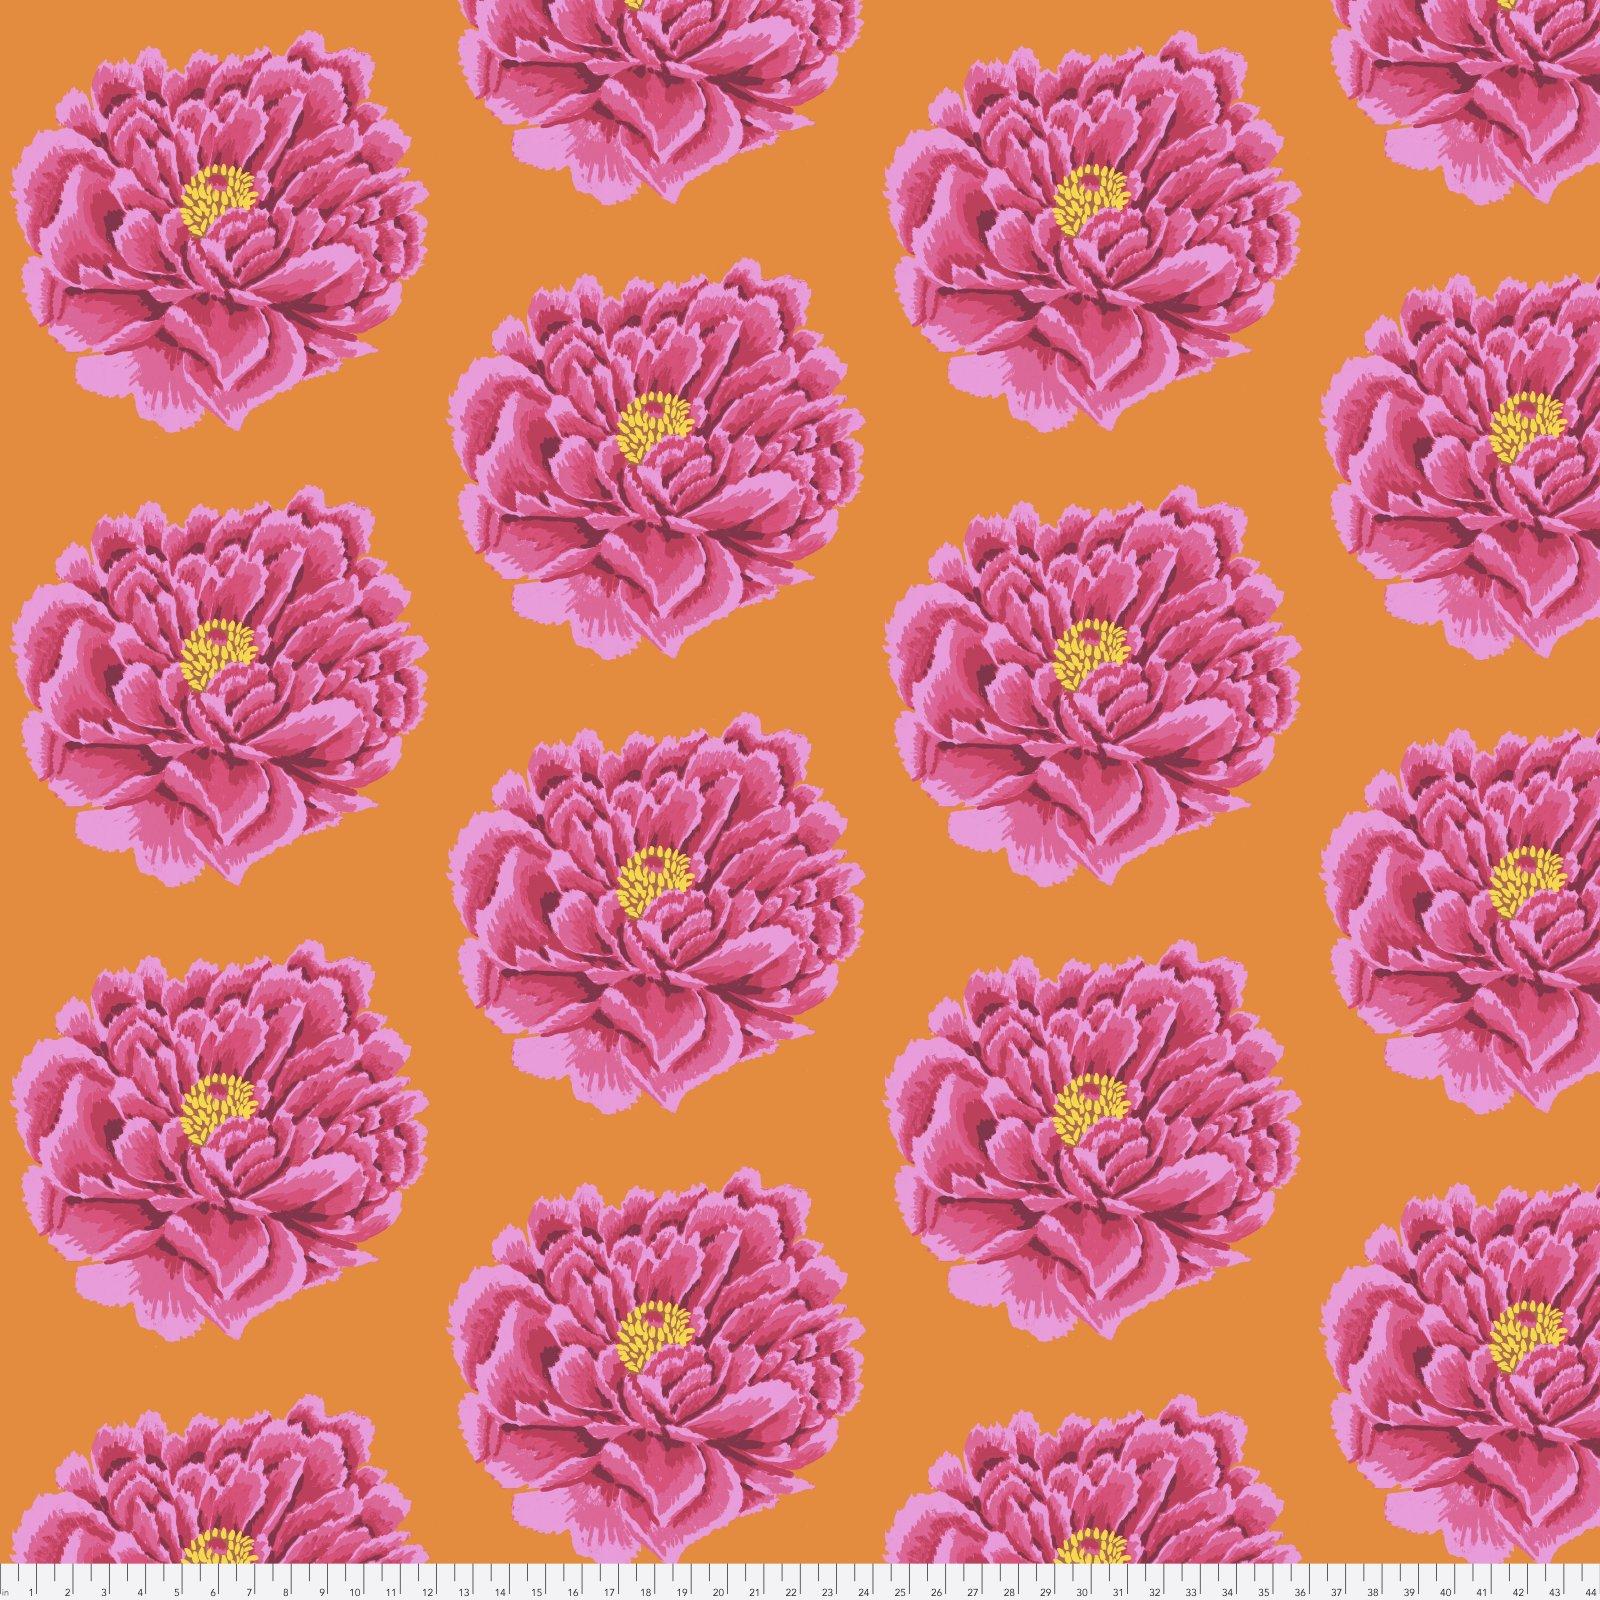 QBGP004.2PINK FAll 2018 Full Blown Pink 100% Cotton Sateen Chintz 108